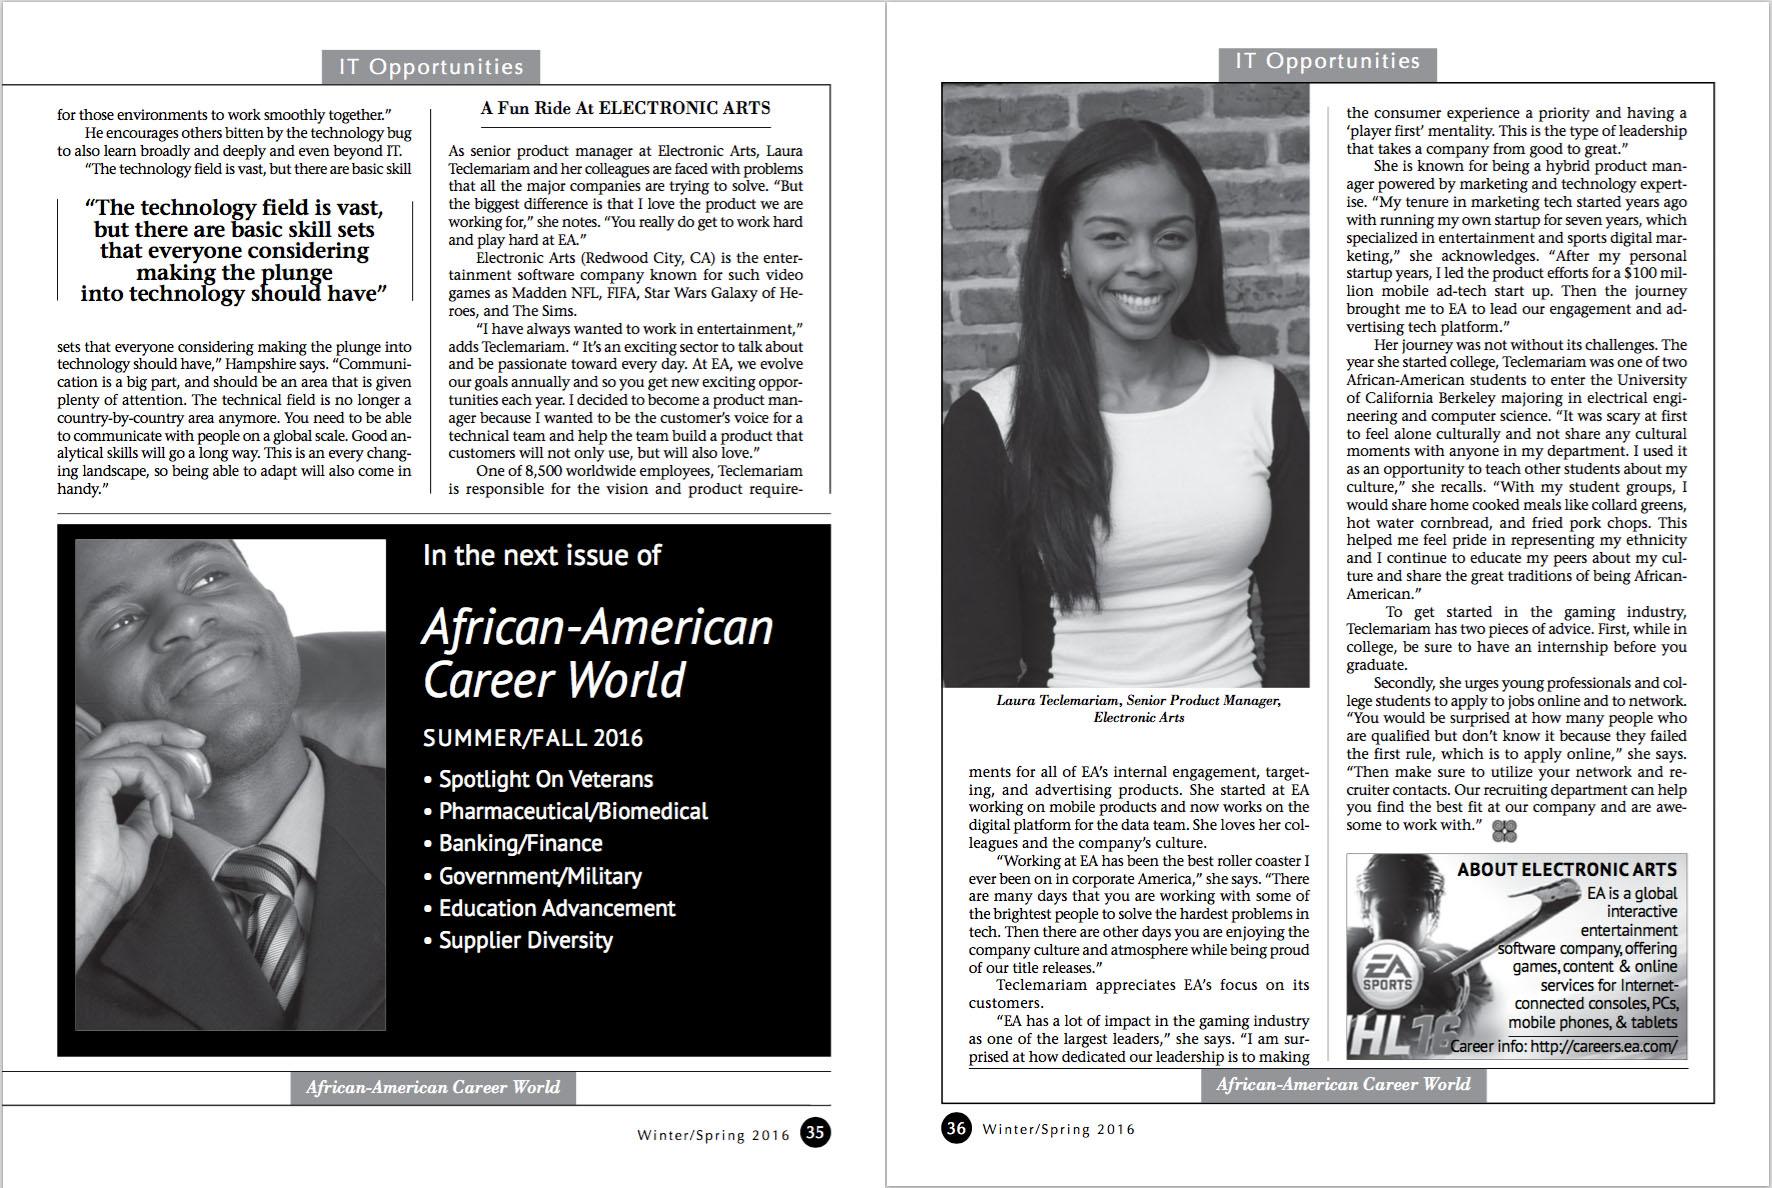 African-American Career World Magazine, February 2016